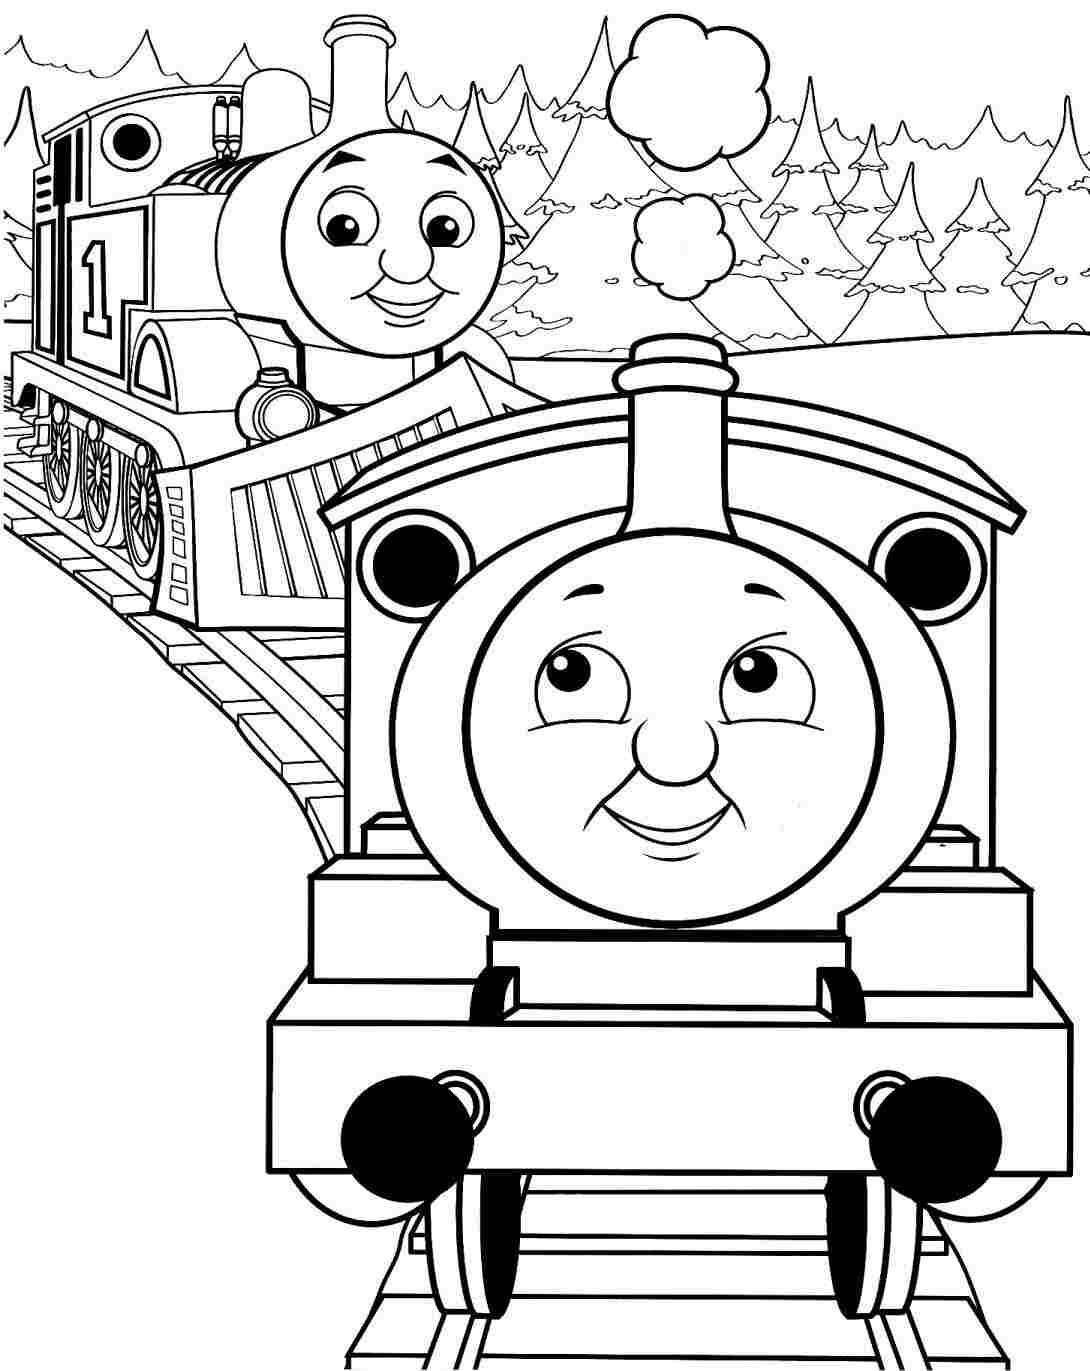 Simple Steam Train Drawing At Getdrawings